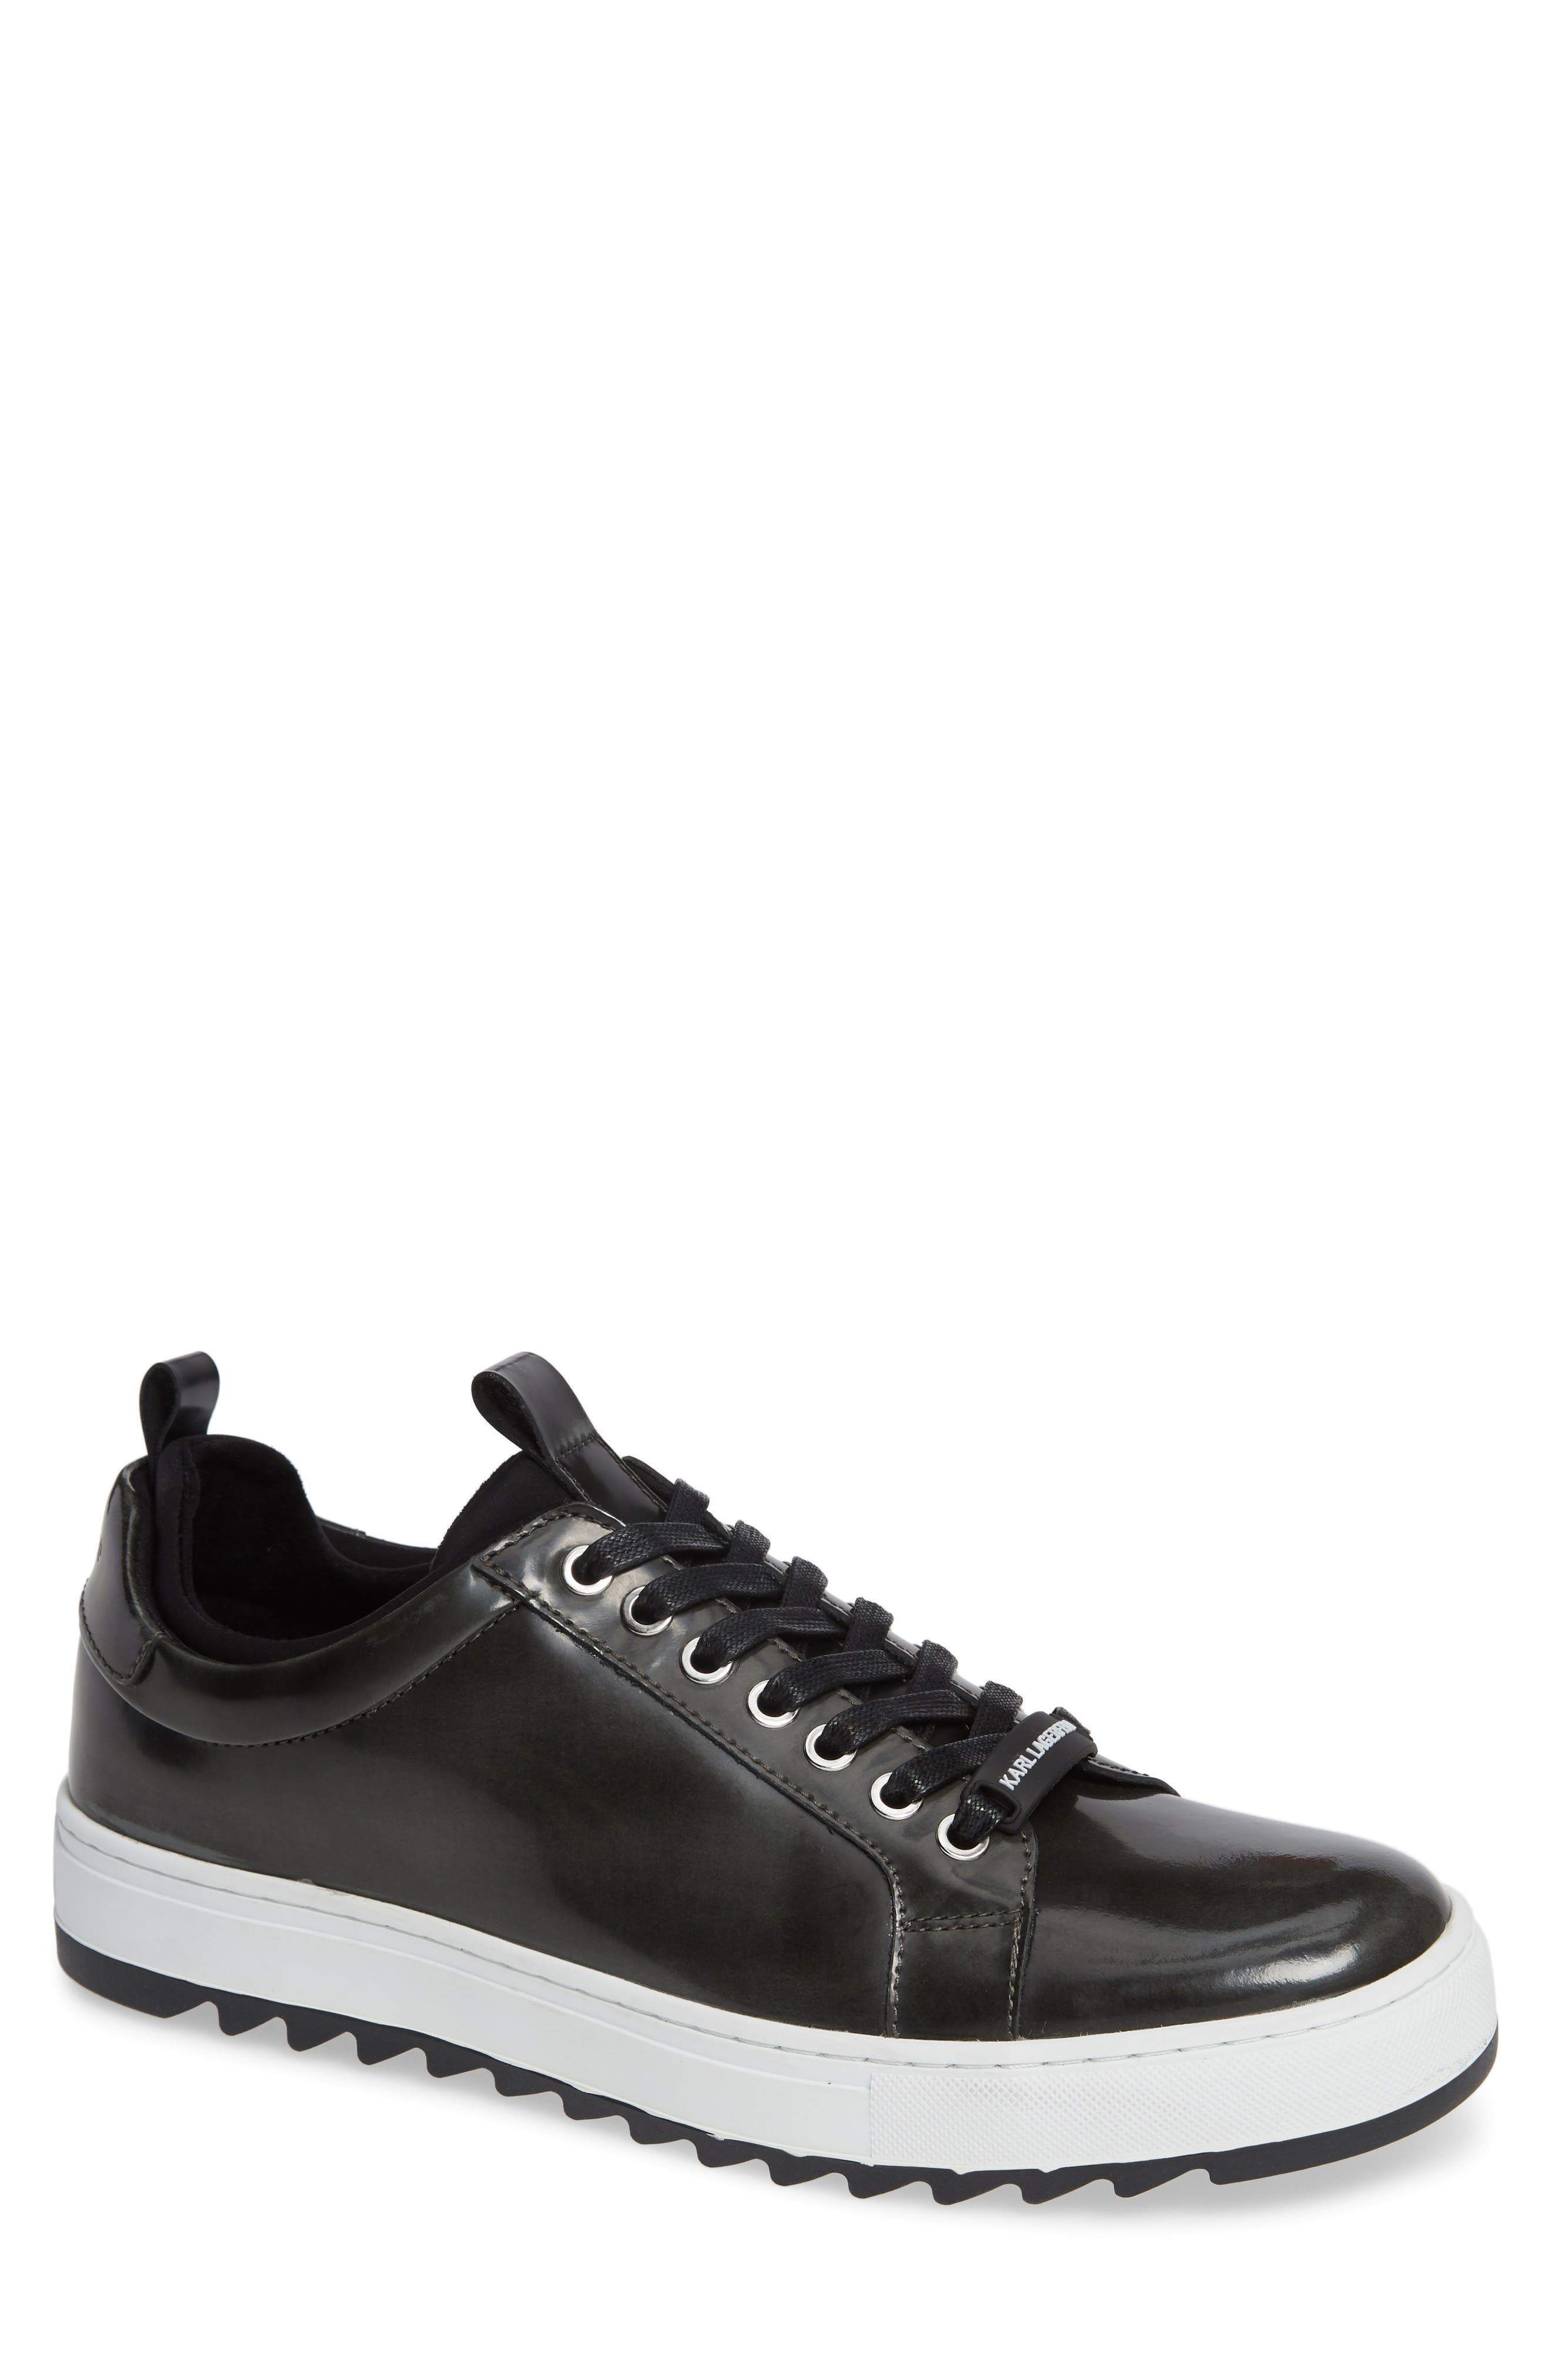 Box Inner Sock Sneaker,                             Main thumbnail 1, color,                             DARK GREY